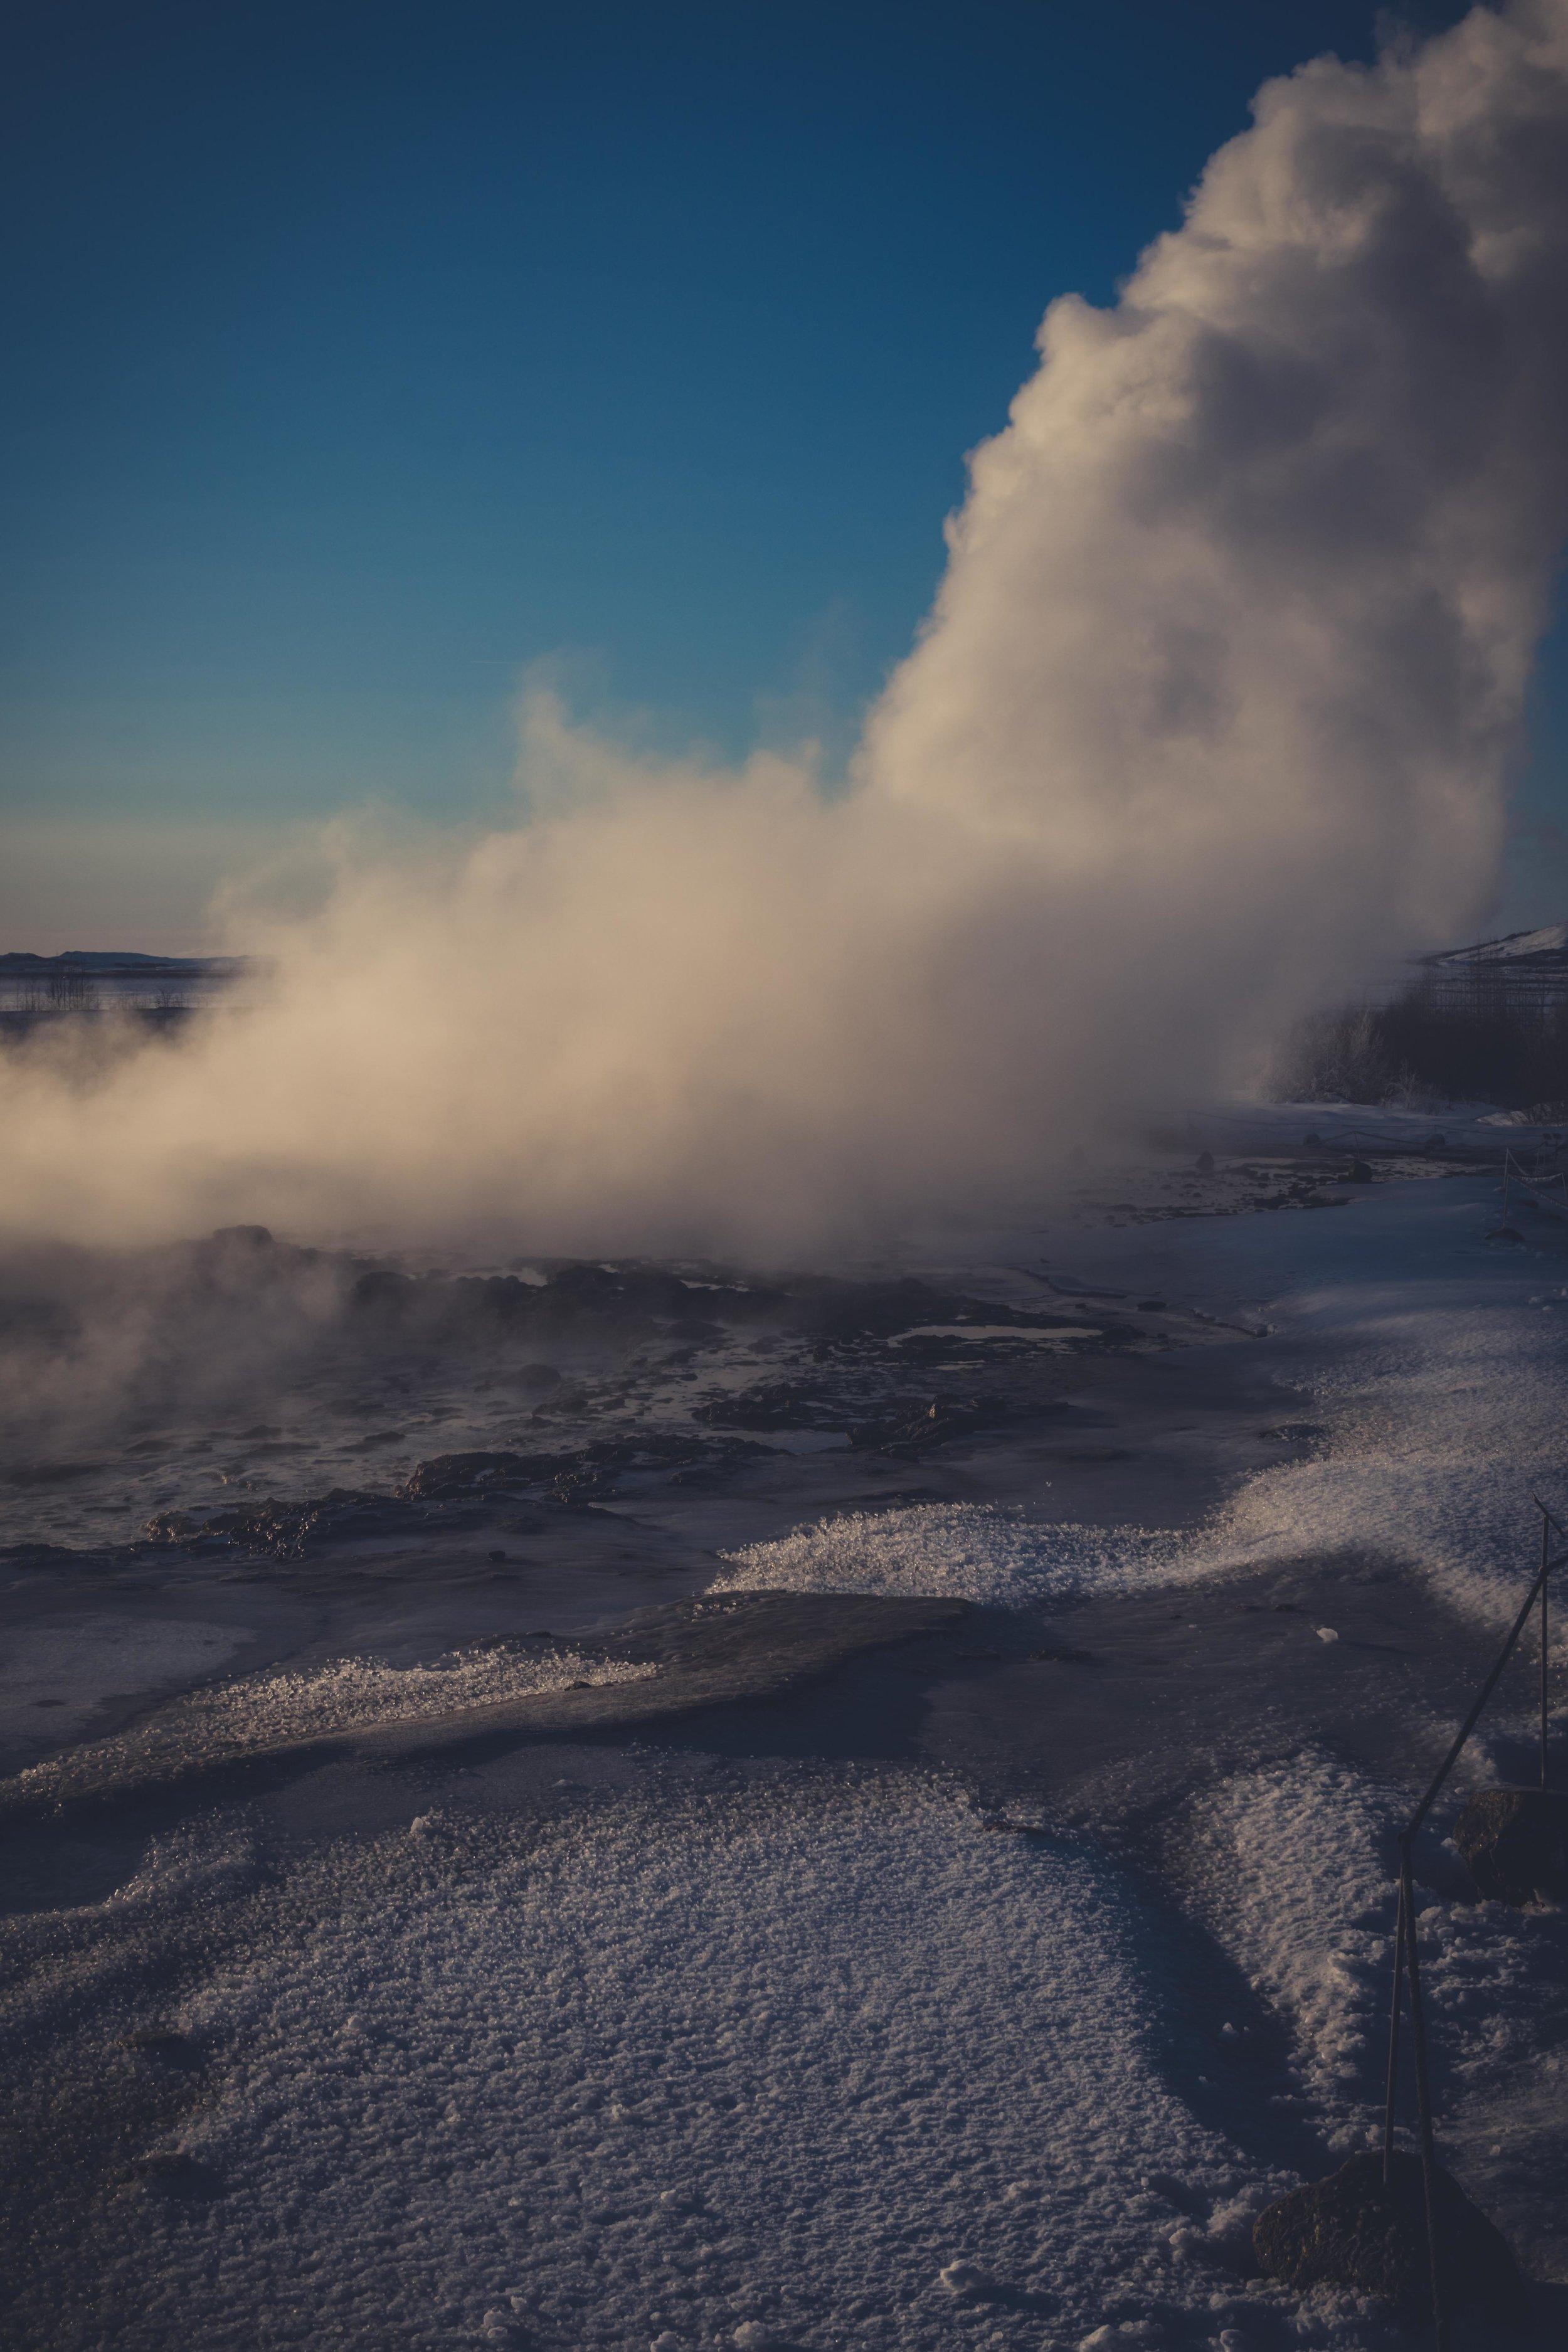 Iceland. snow. travel. adventure. photography. trip. epic landscape. snow. cold. freezing. sunrise. long exposure selfie. blow hole...jpg